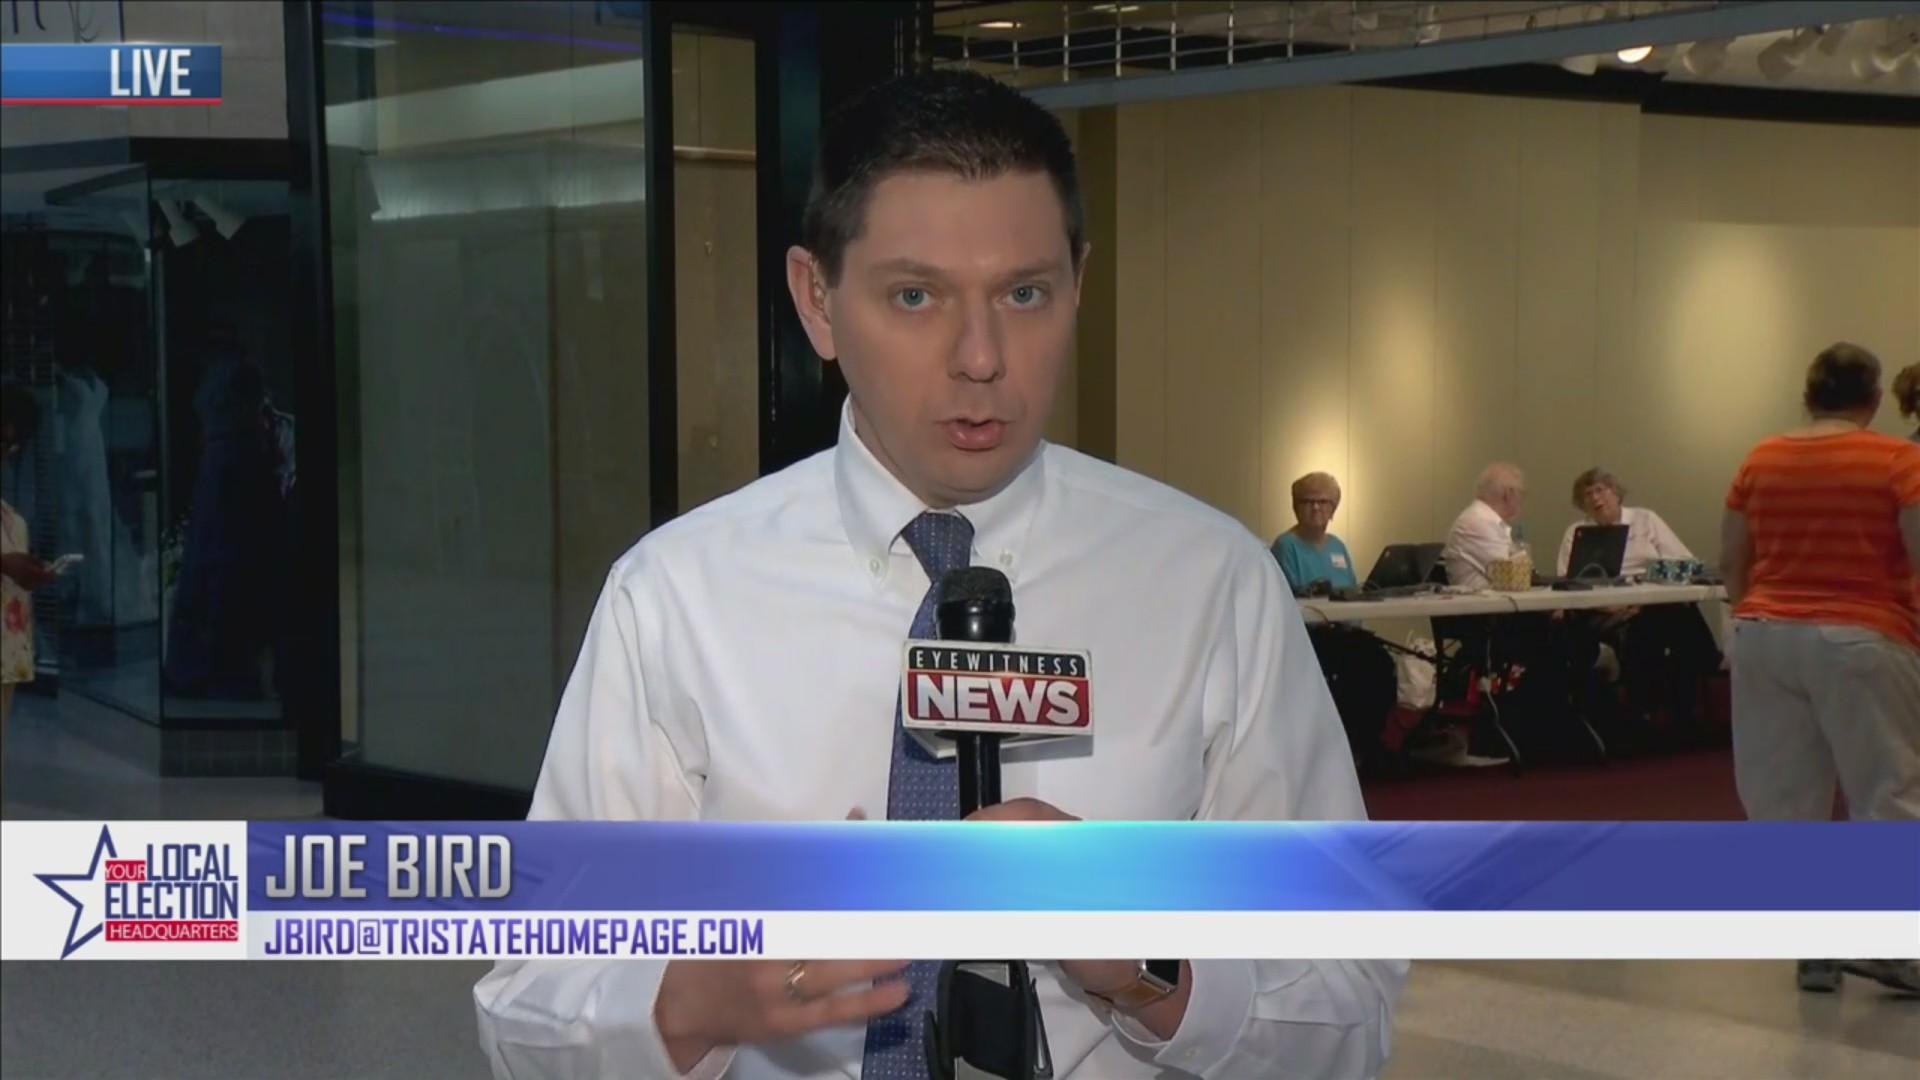 Joe Bird previews Indiana Primary polling